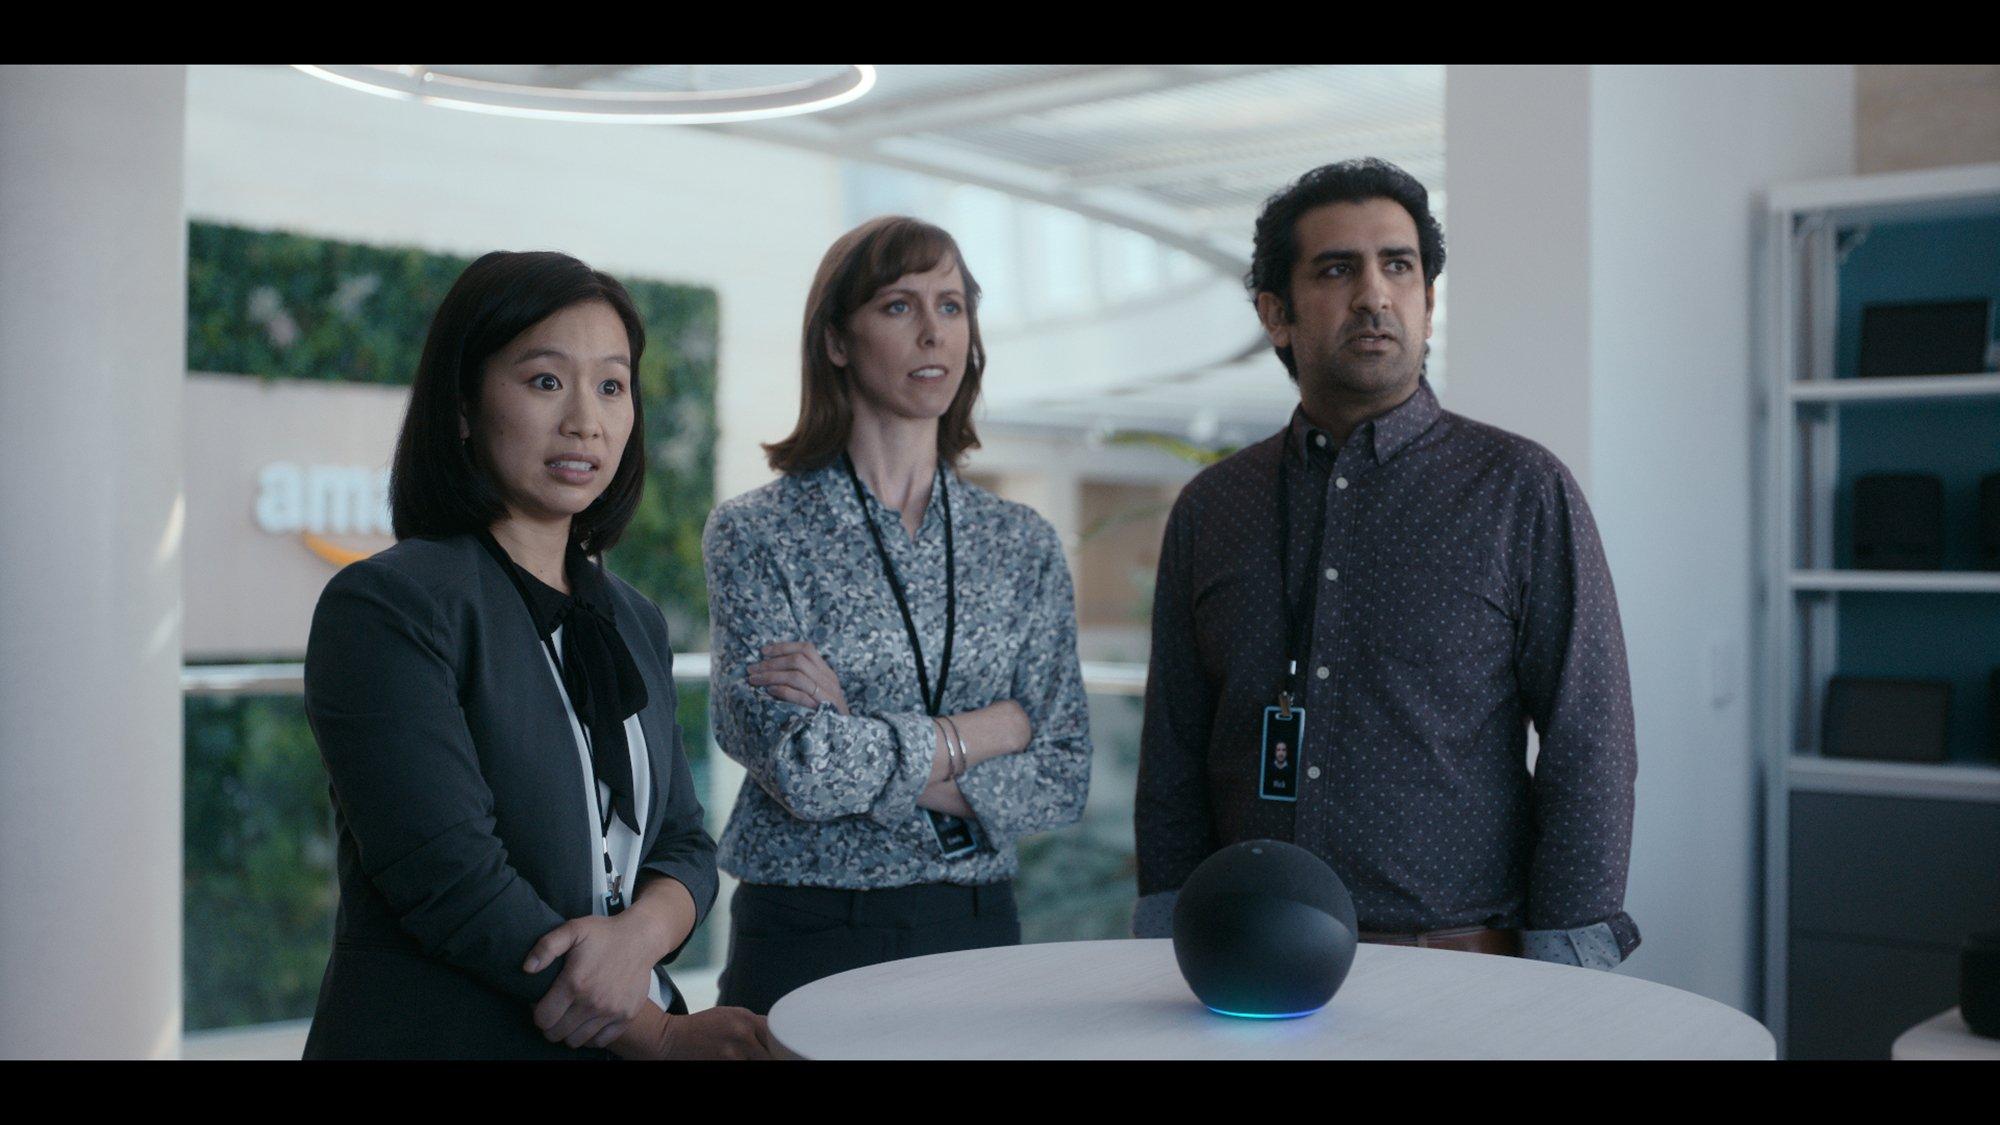 Amazon, Cadillac score with Super Bowl ads